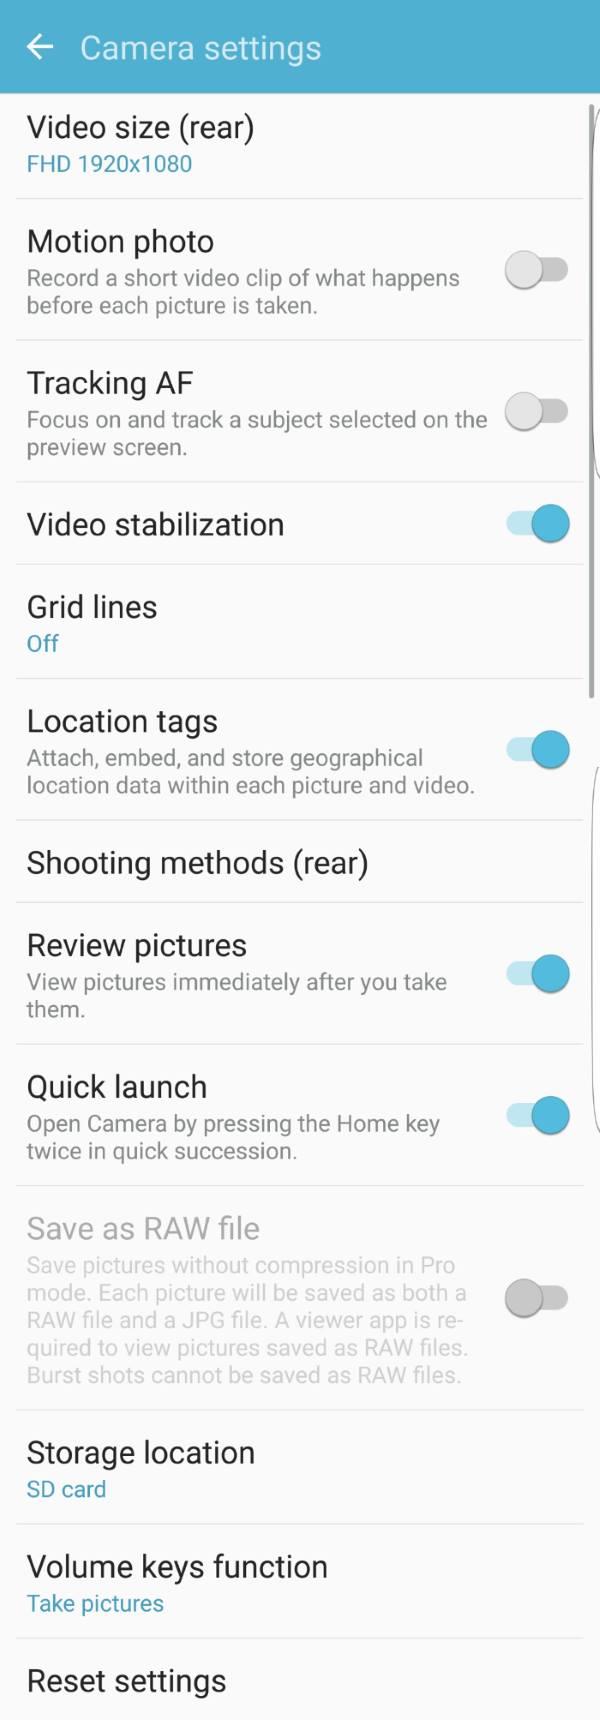 Samsung Galaxy S7 camera settings for rear camera